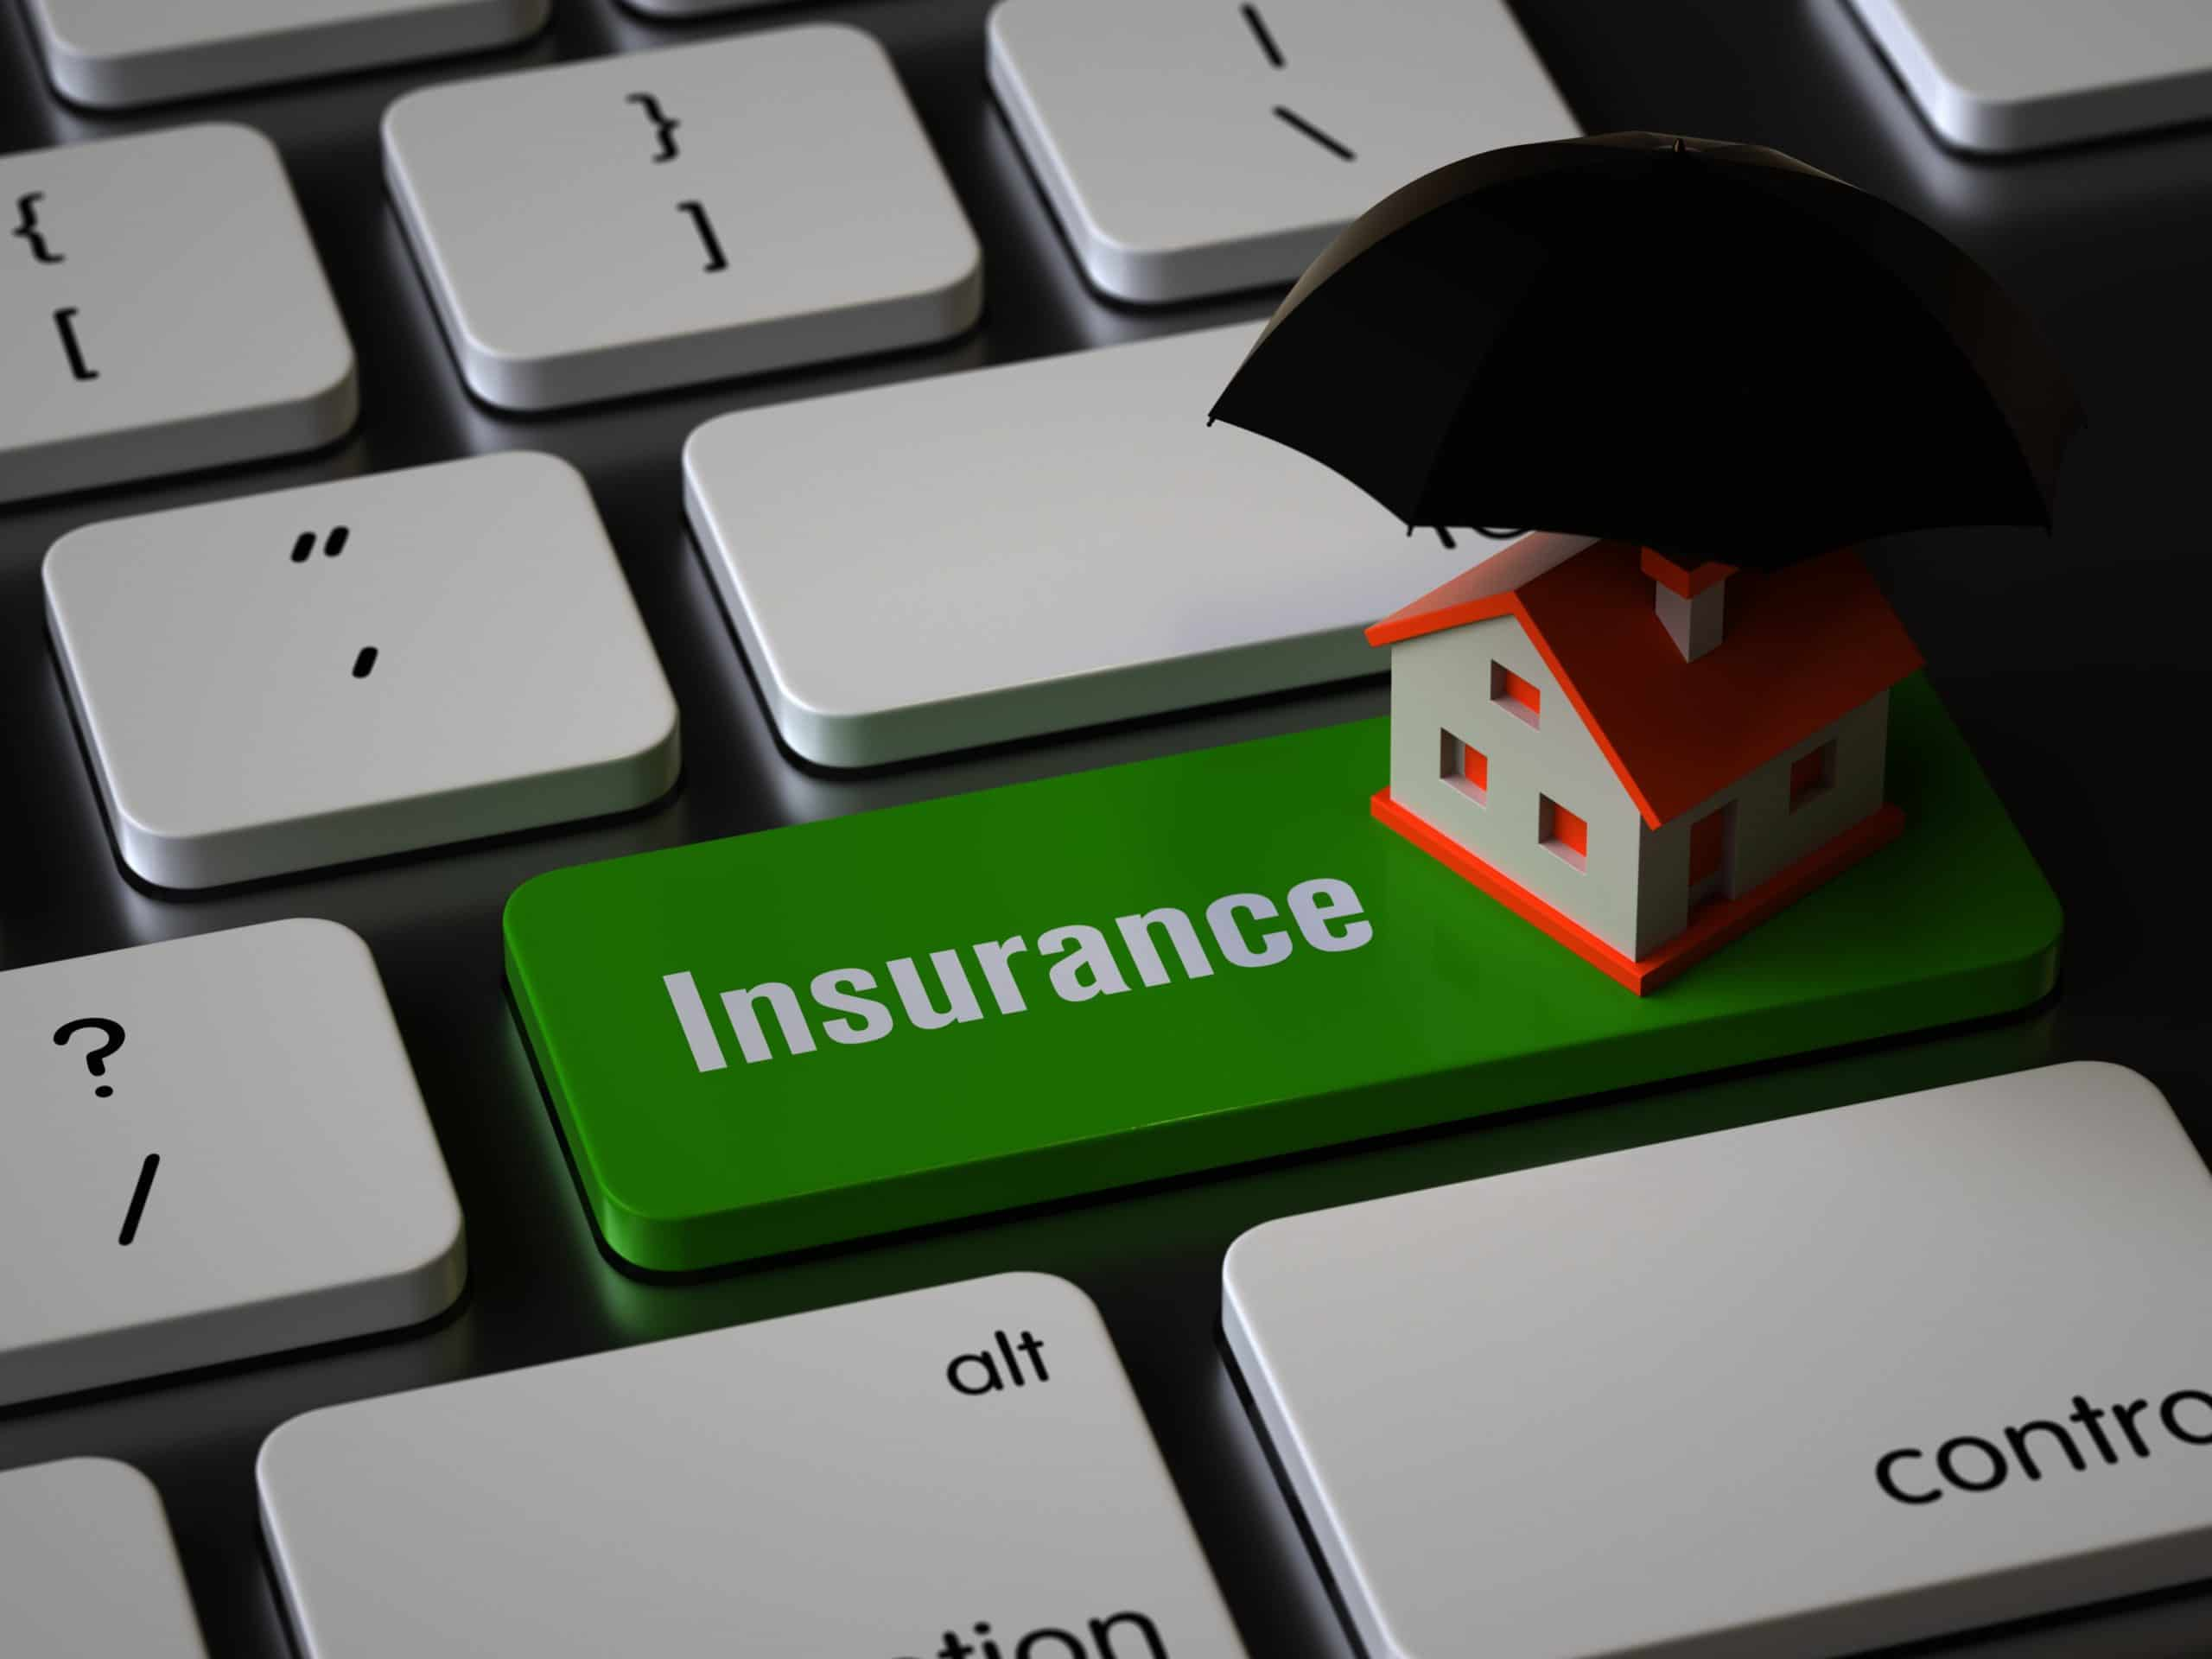 toy house under umbrella sitting on keyboard with large Insurance key